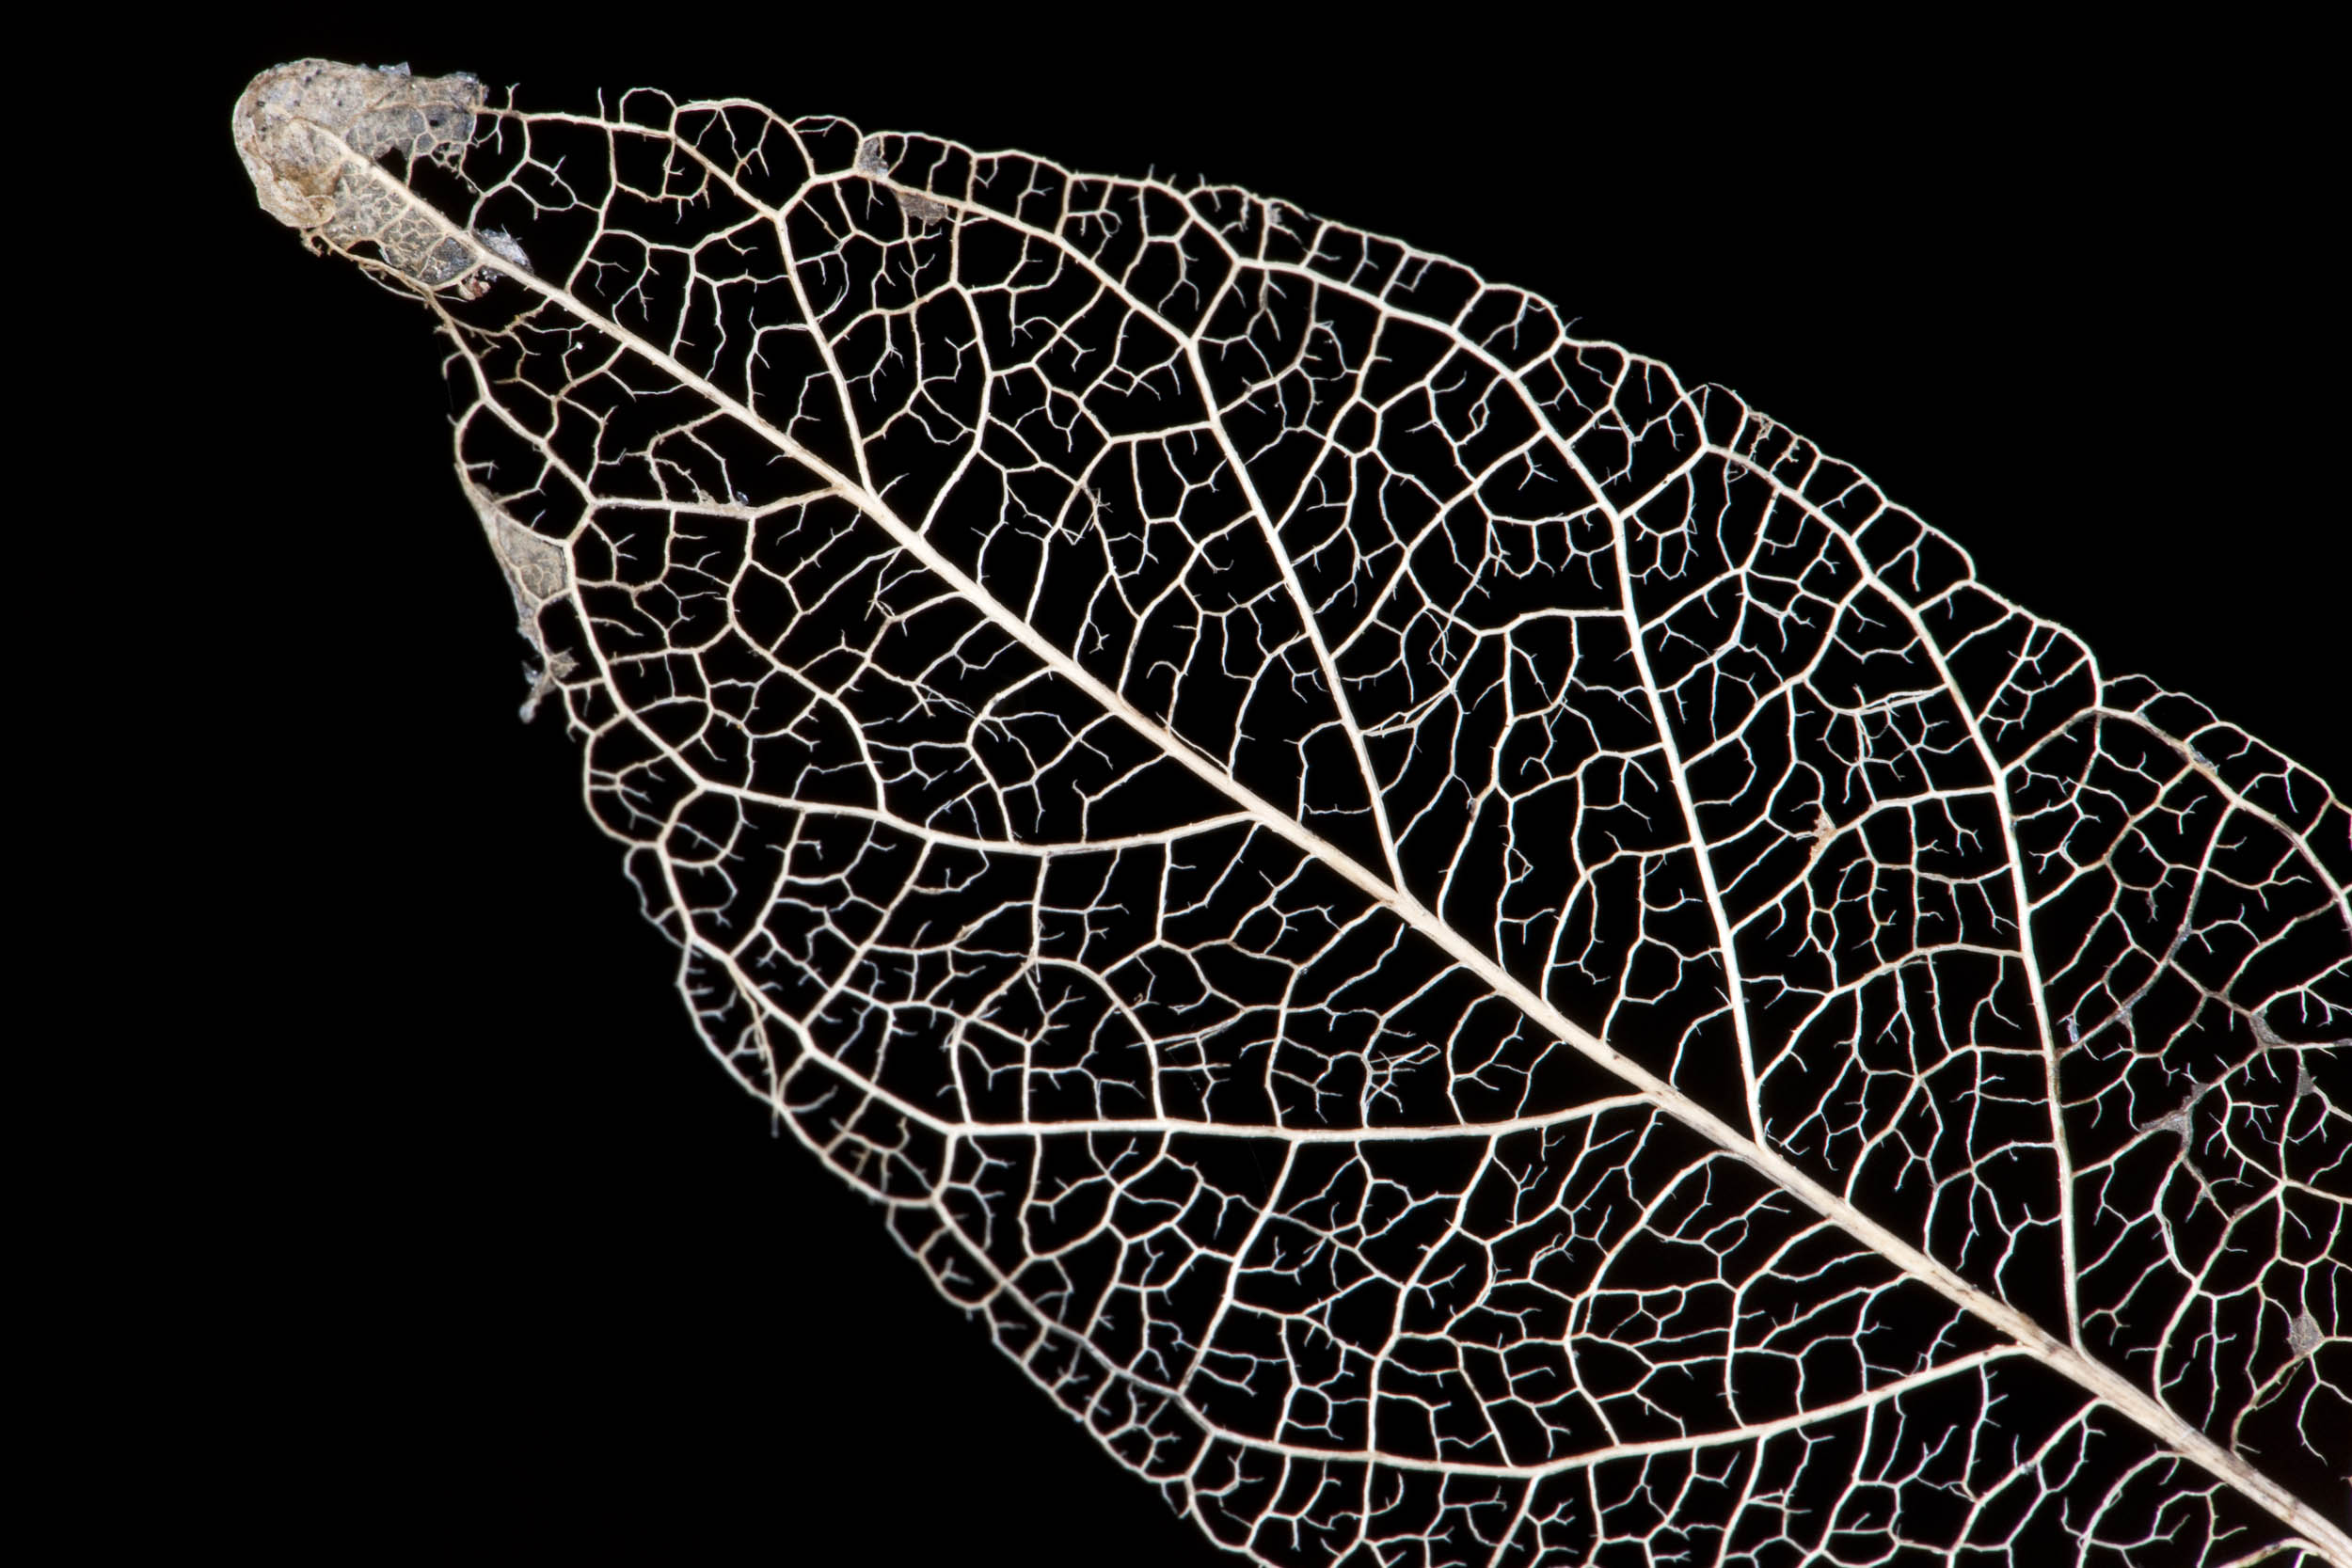 Estructura, Australia - Gaia - Hector Garrido, Aerial and human photography